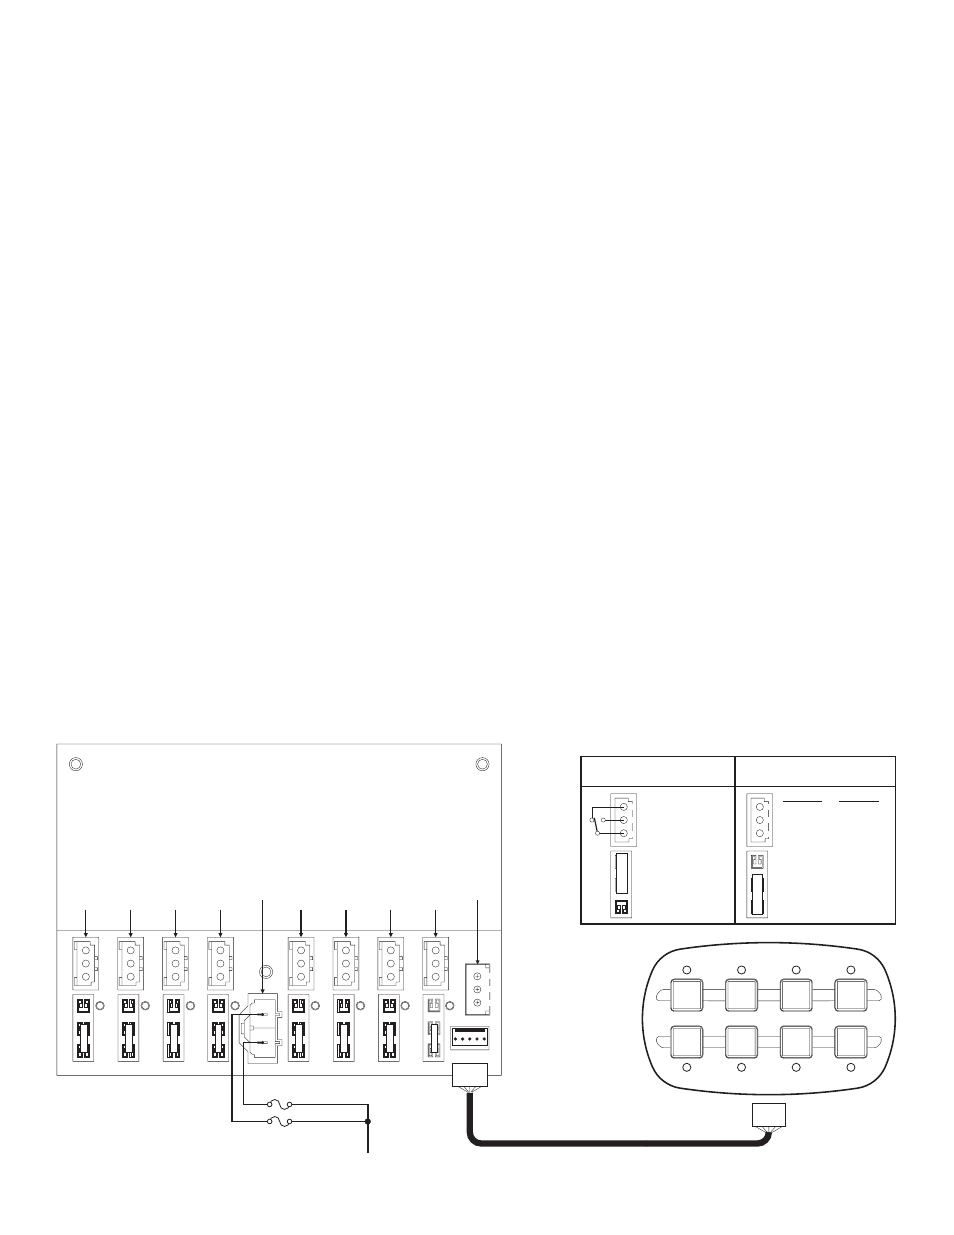 whelen pcc8r user manual page 2 3 rh manualsdir com